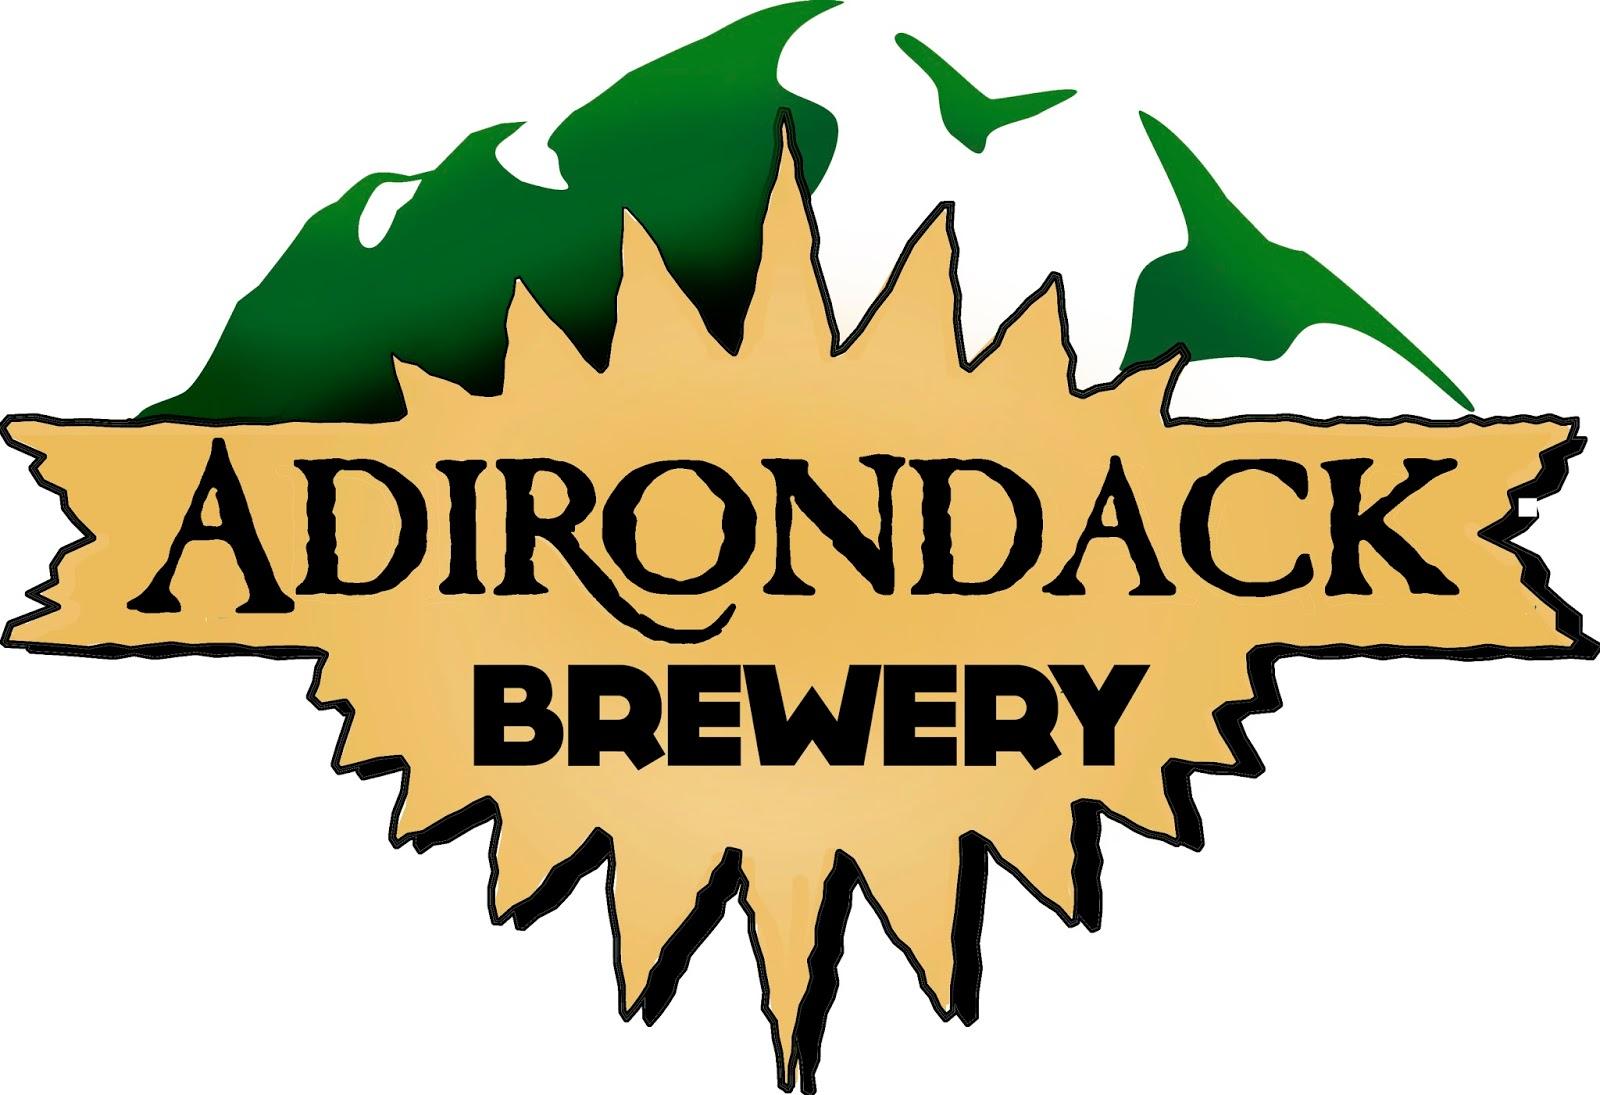 adirondak-pub-brewery_large.jpg - Picture of Adirondack